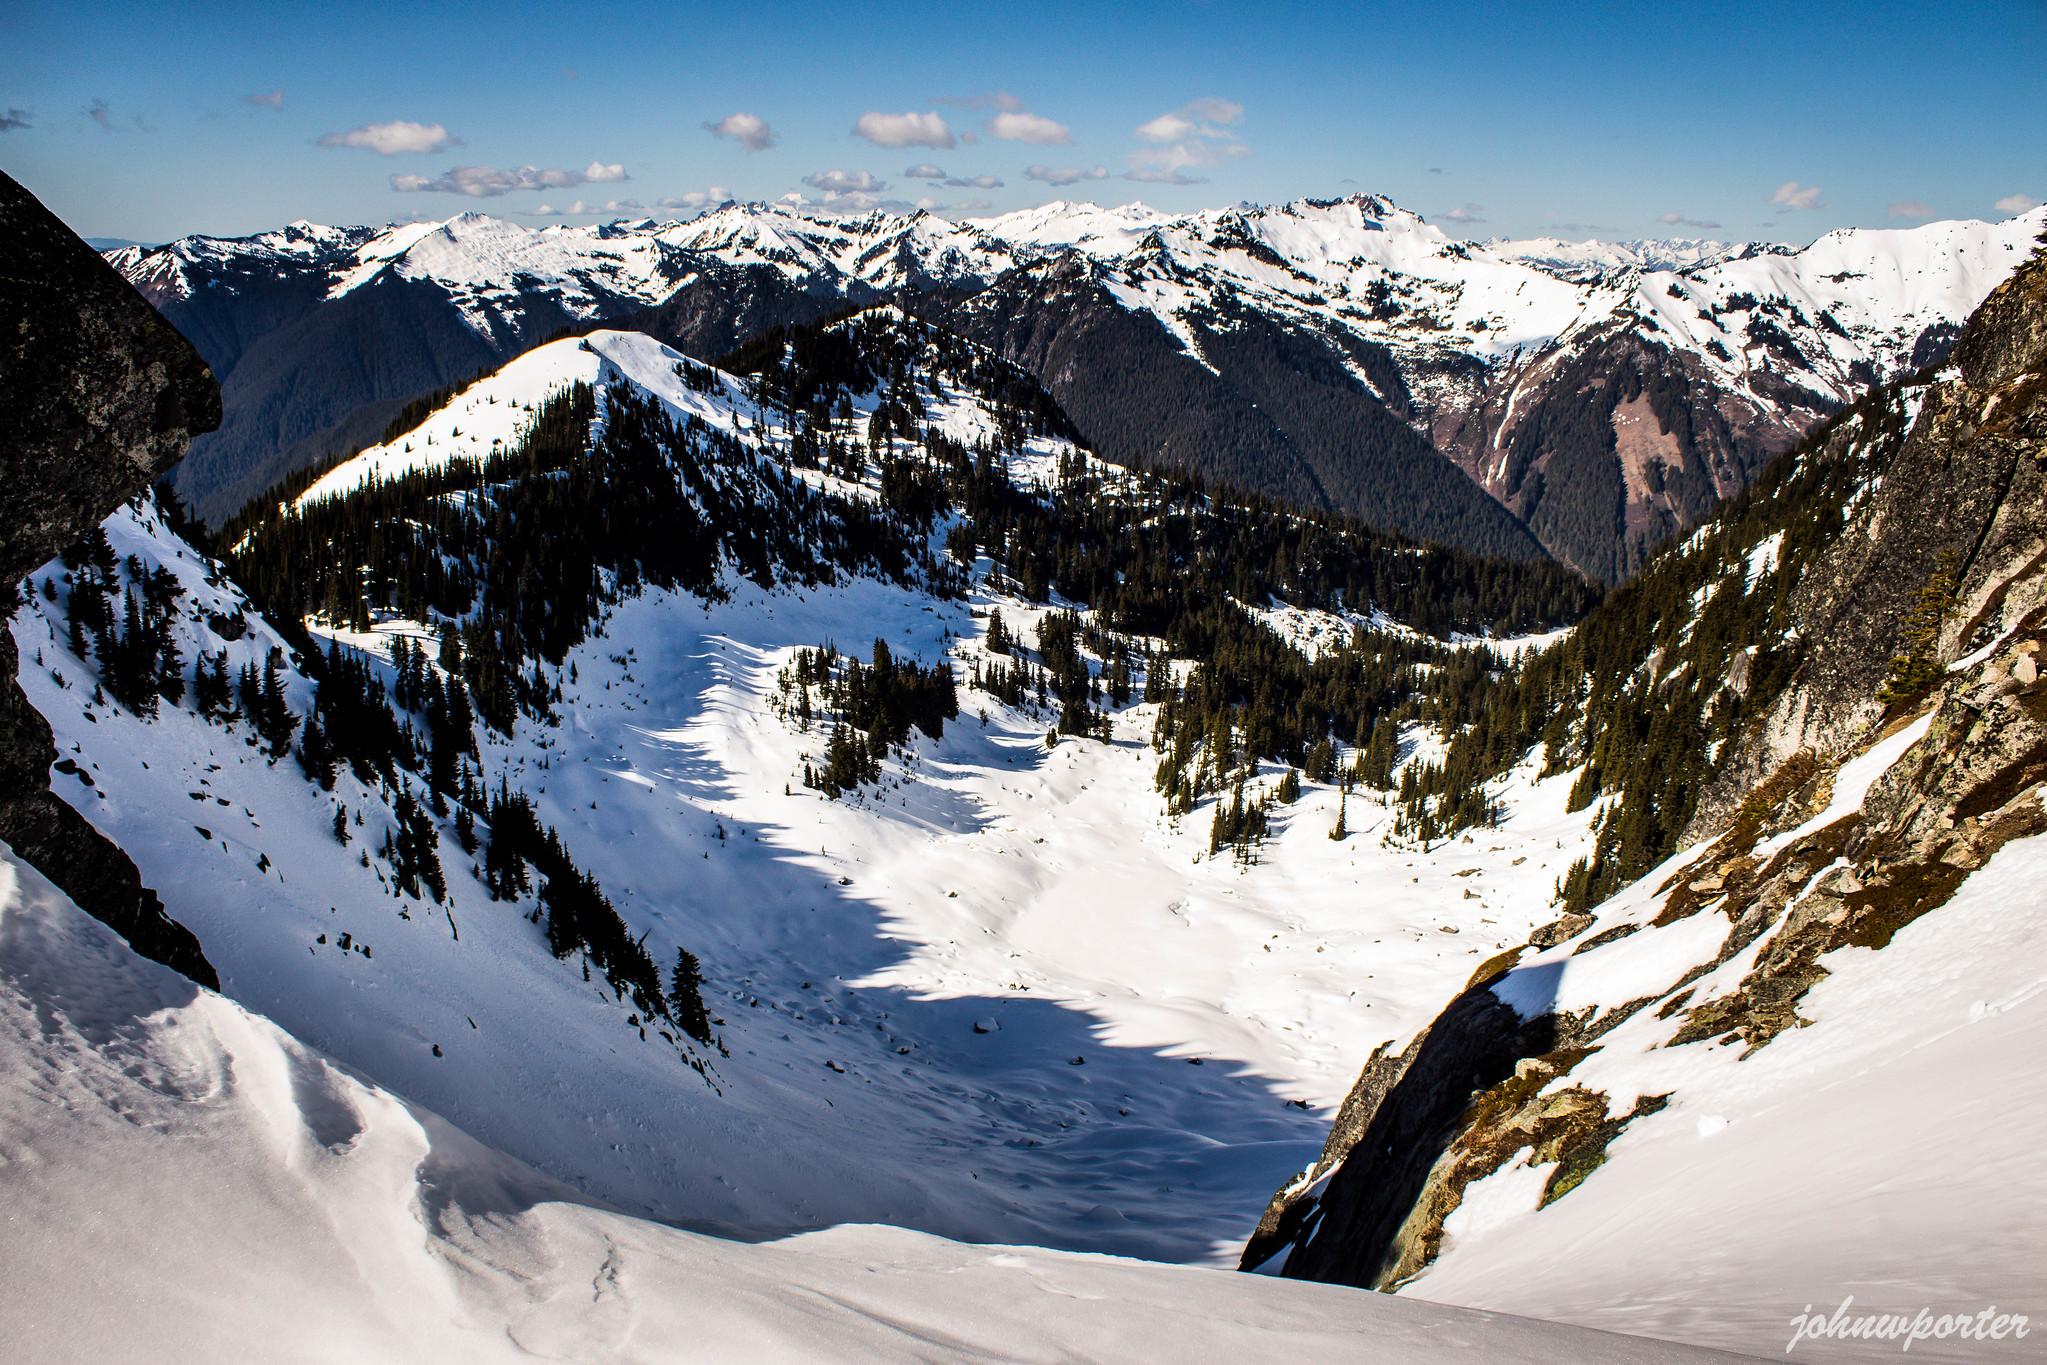 Lookout Lake Basin